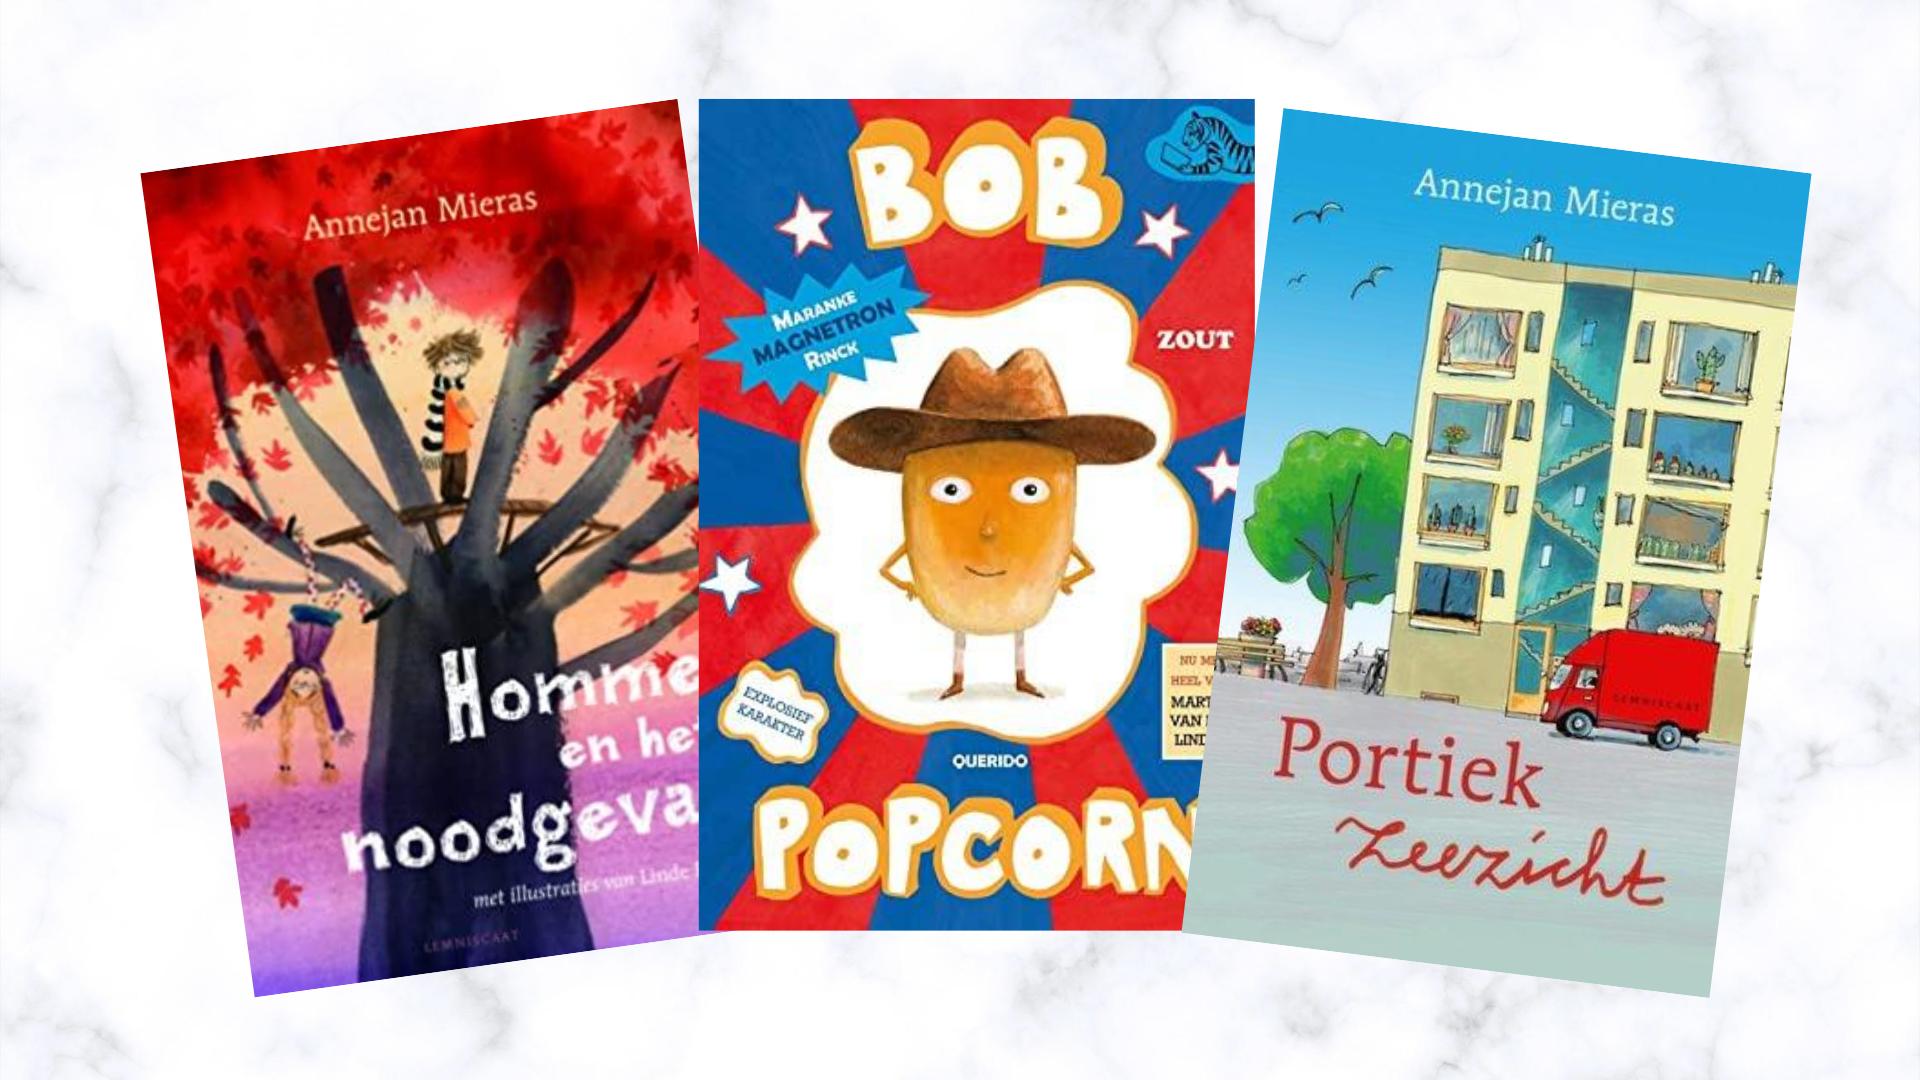 kinderboeken bob popcorn annejan Mieras portiek zeezicht